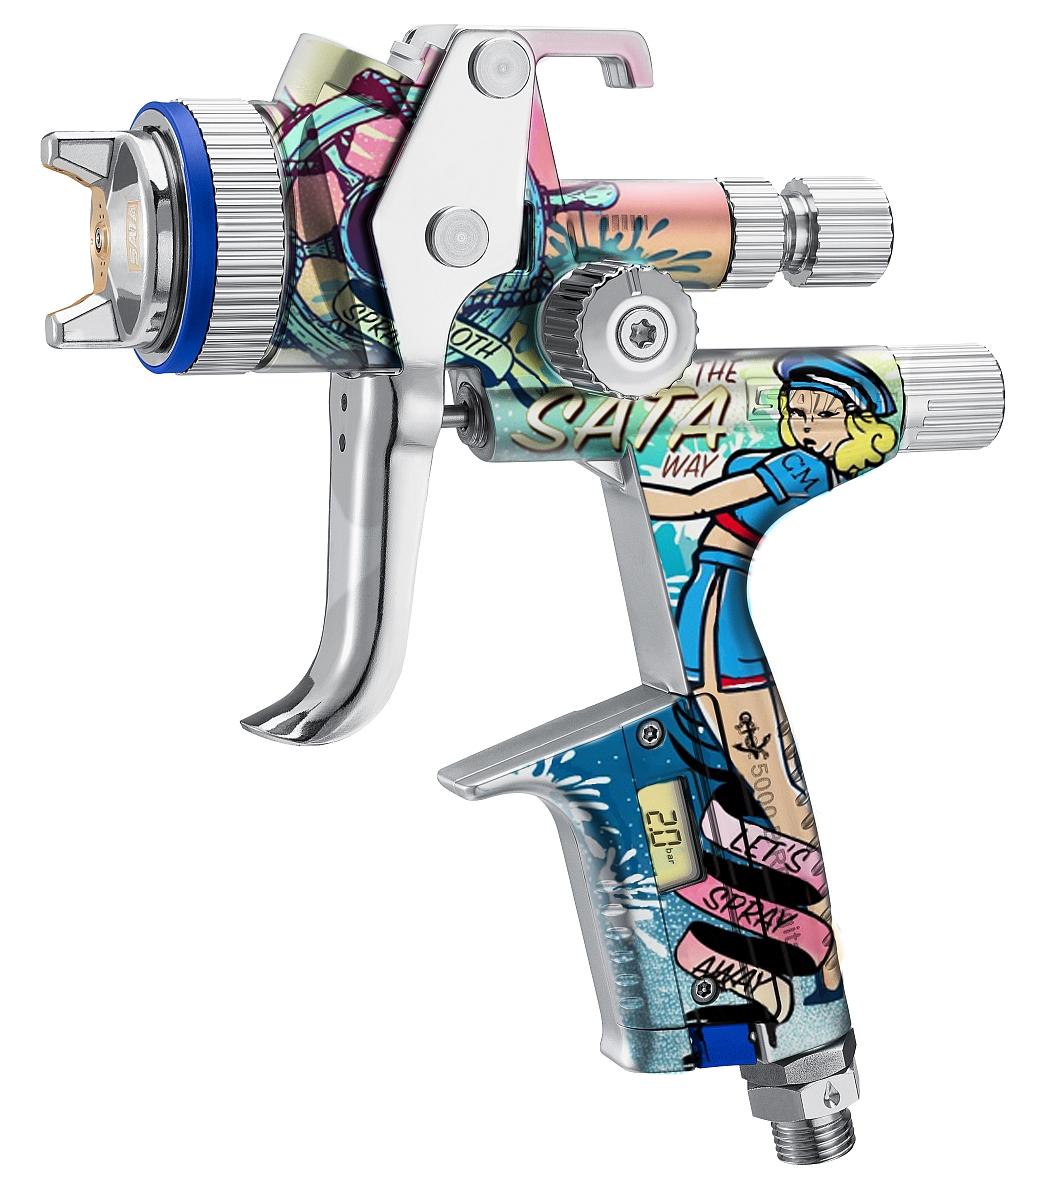 satajet-5000-b-sailor-spray-away